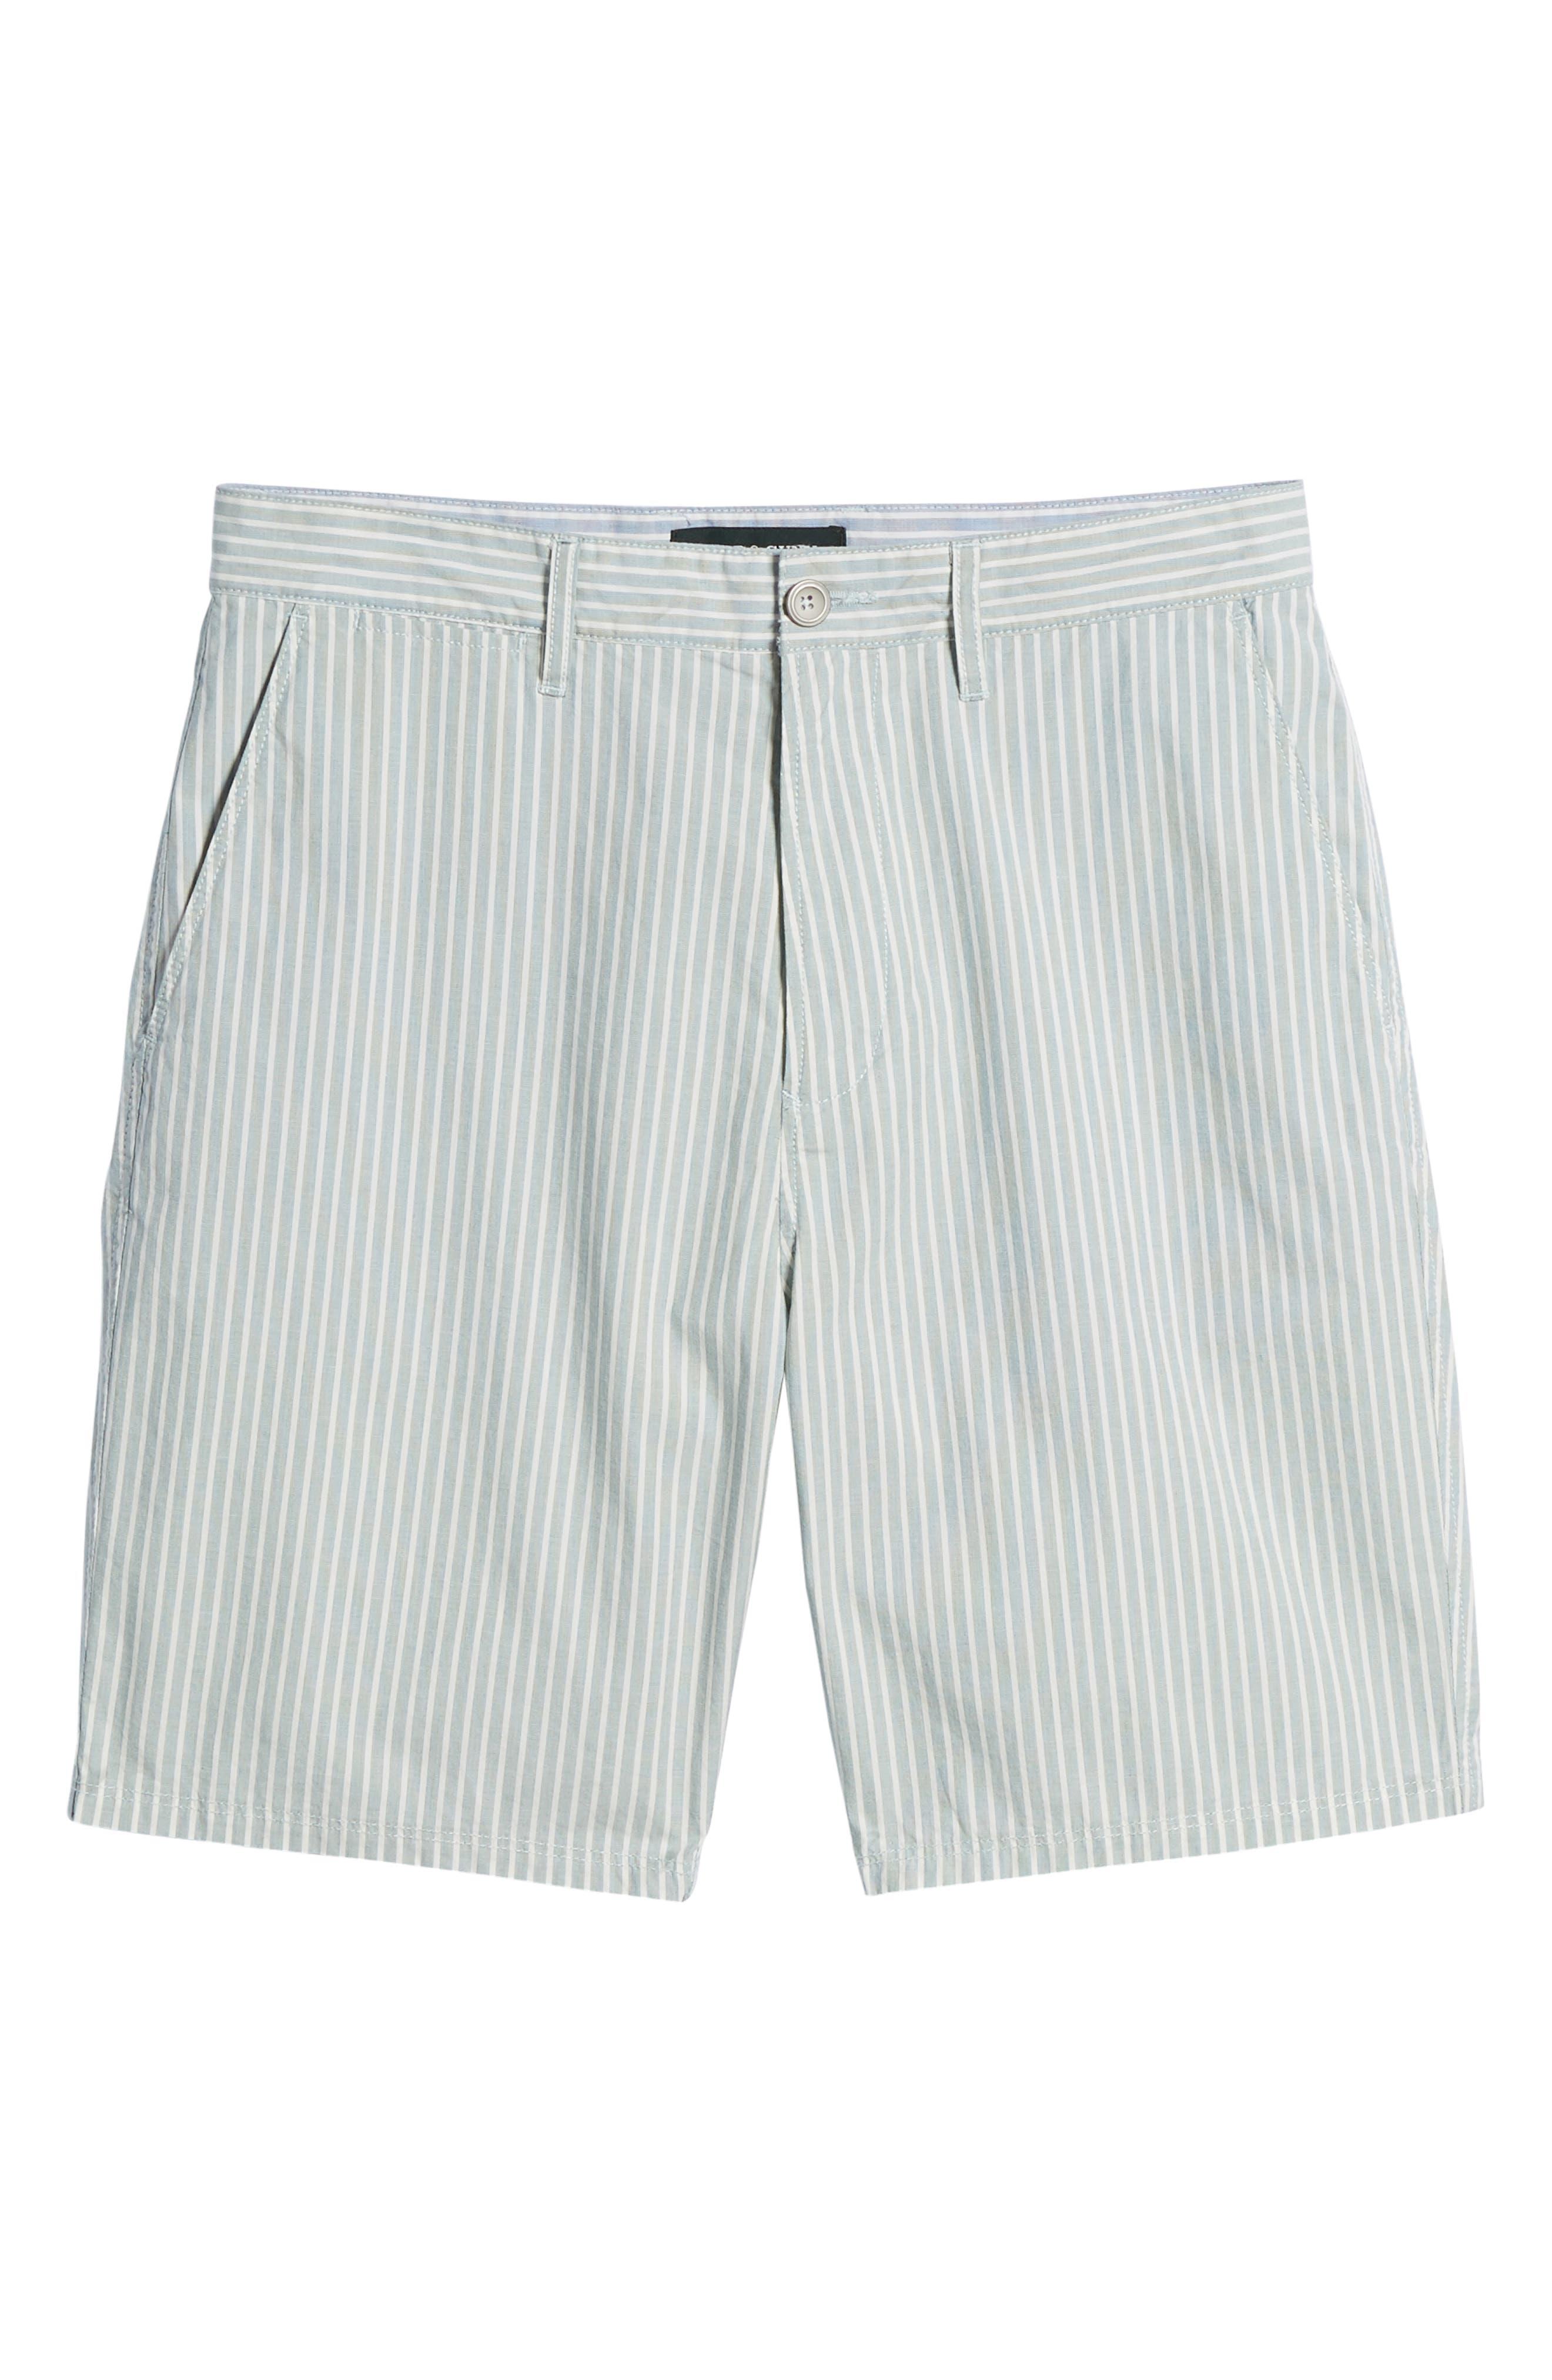 Preston Regular Fit Flat Front Shorts,                             Alternate thumbnail 6, color,                             PINE